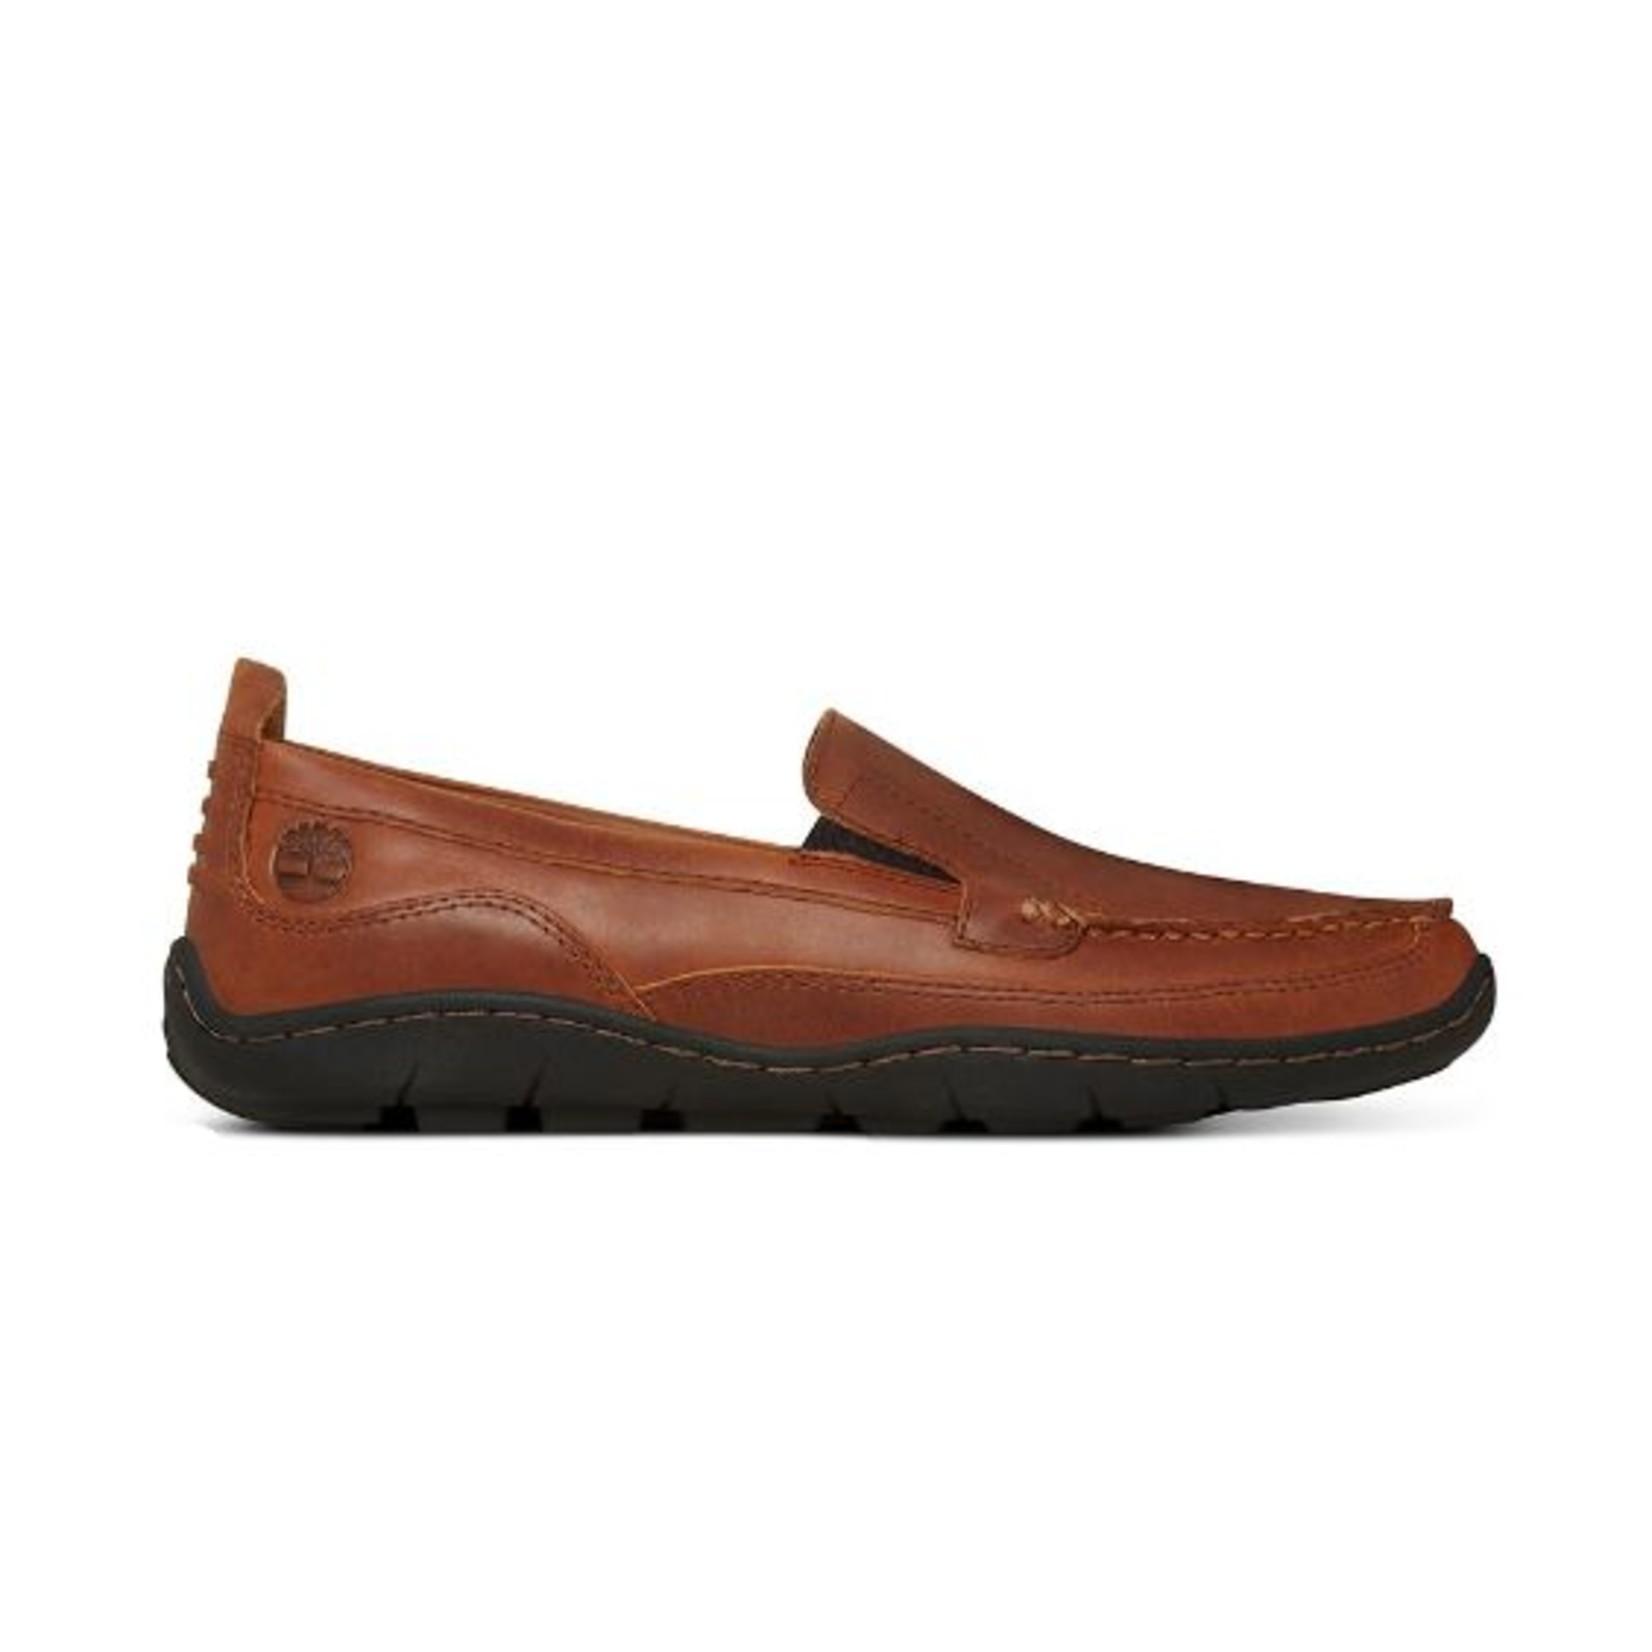 Timberland Mens Sandspoint Venetian Shoe Tan